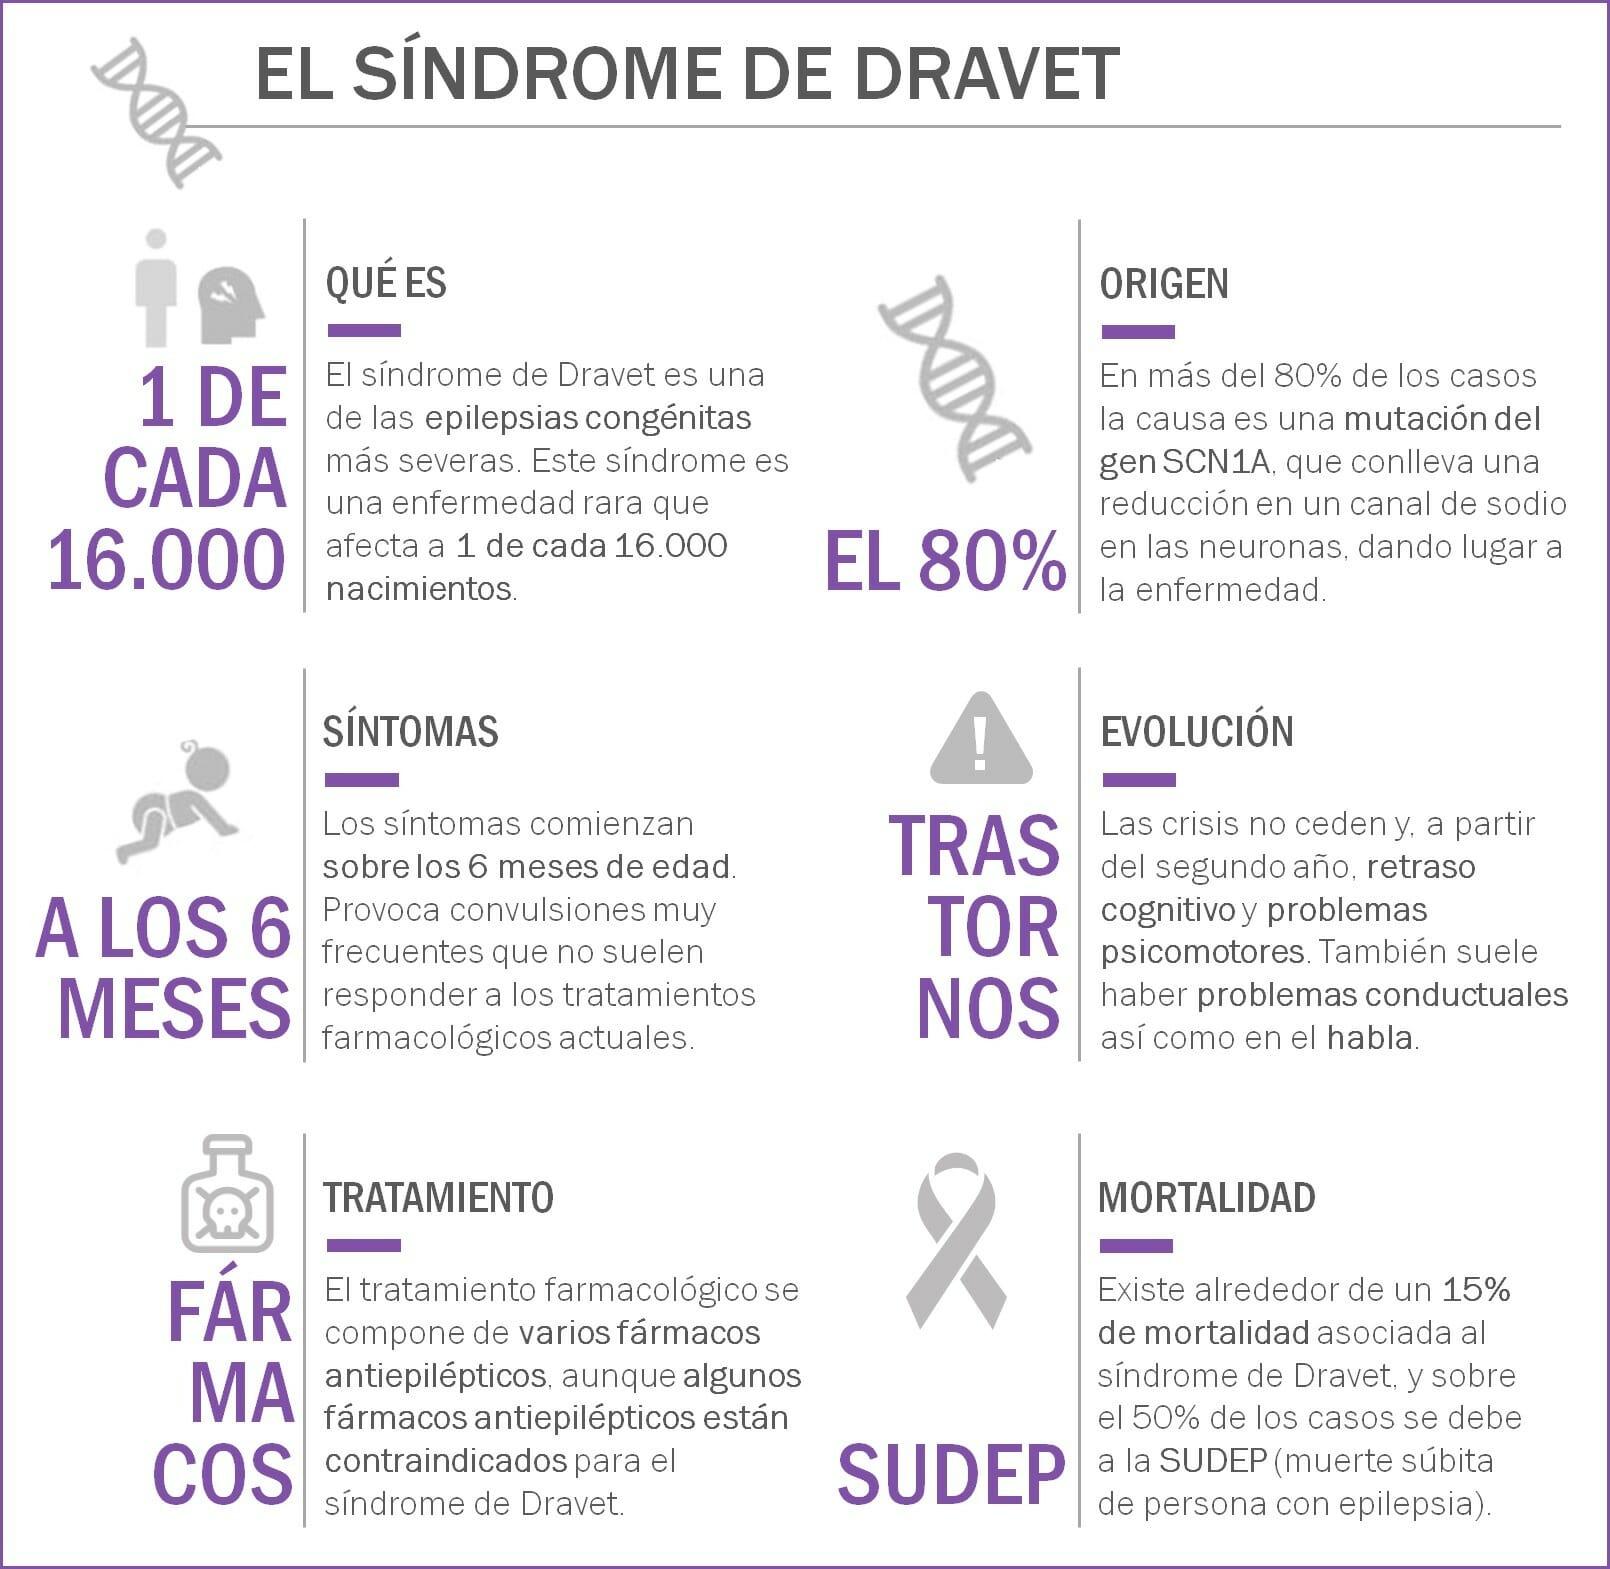 Infografía sobre el síndrome de Dravet